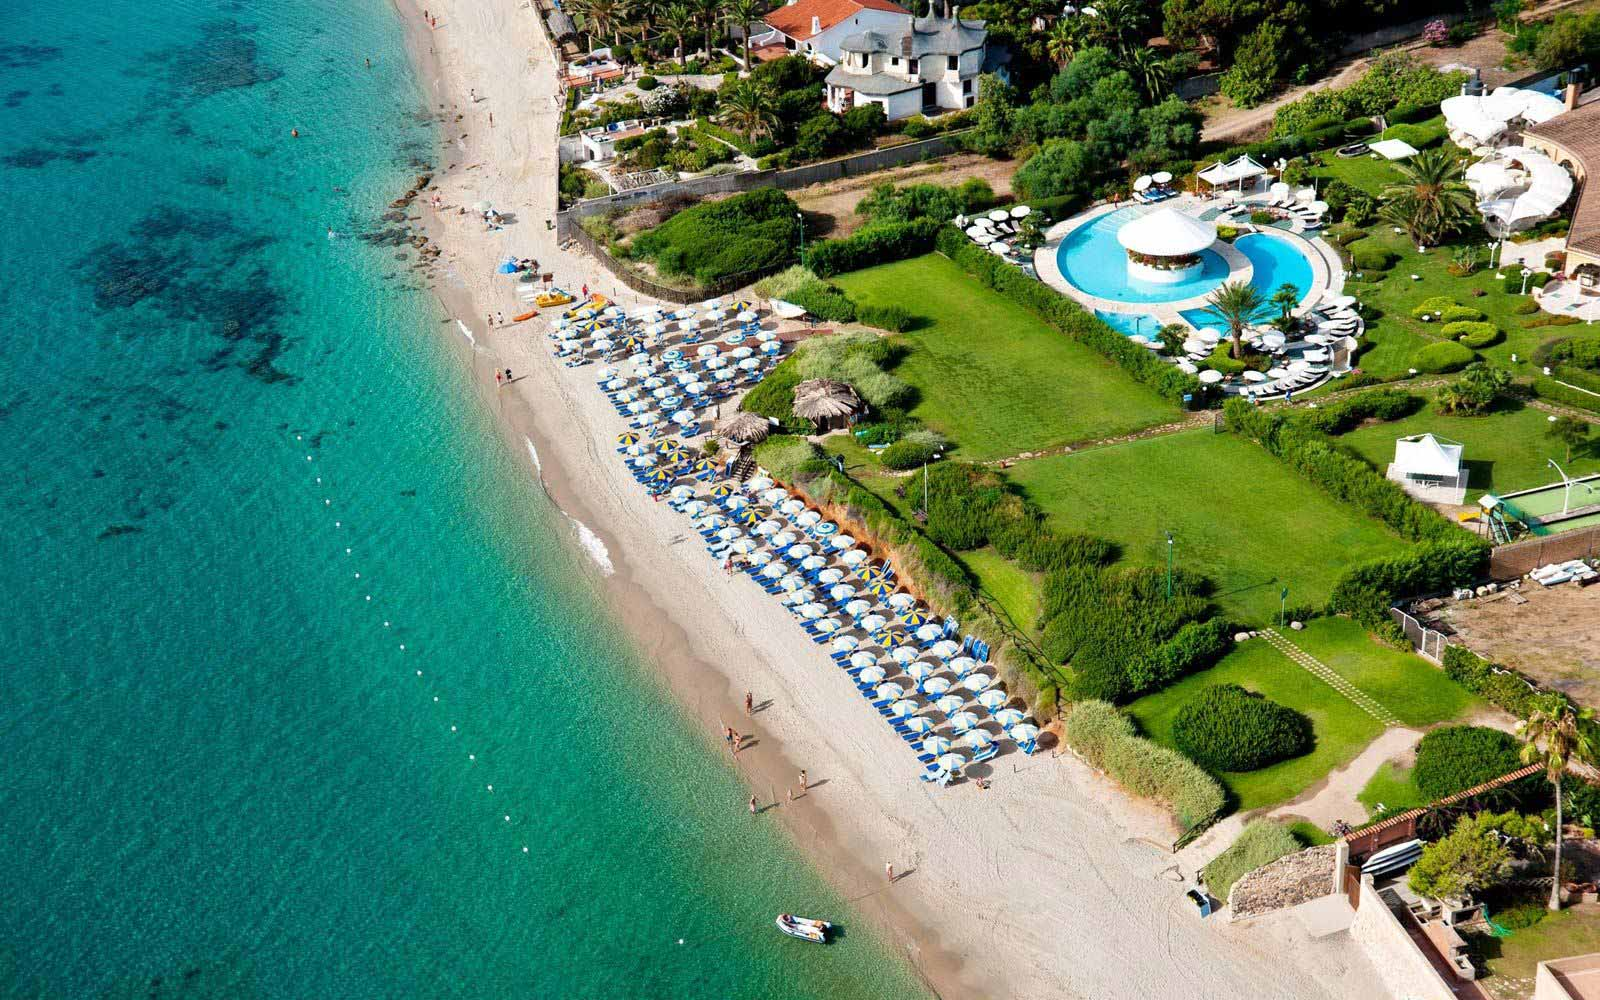 Panoramic view at Hotel Baia Di Nora